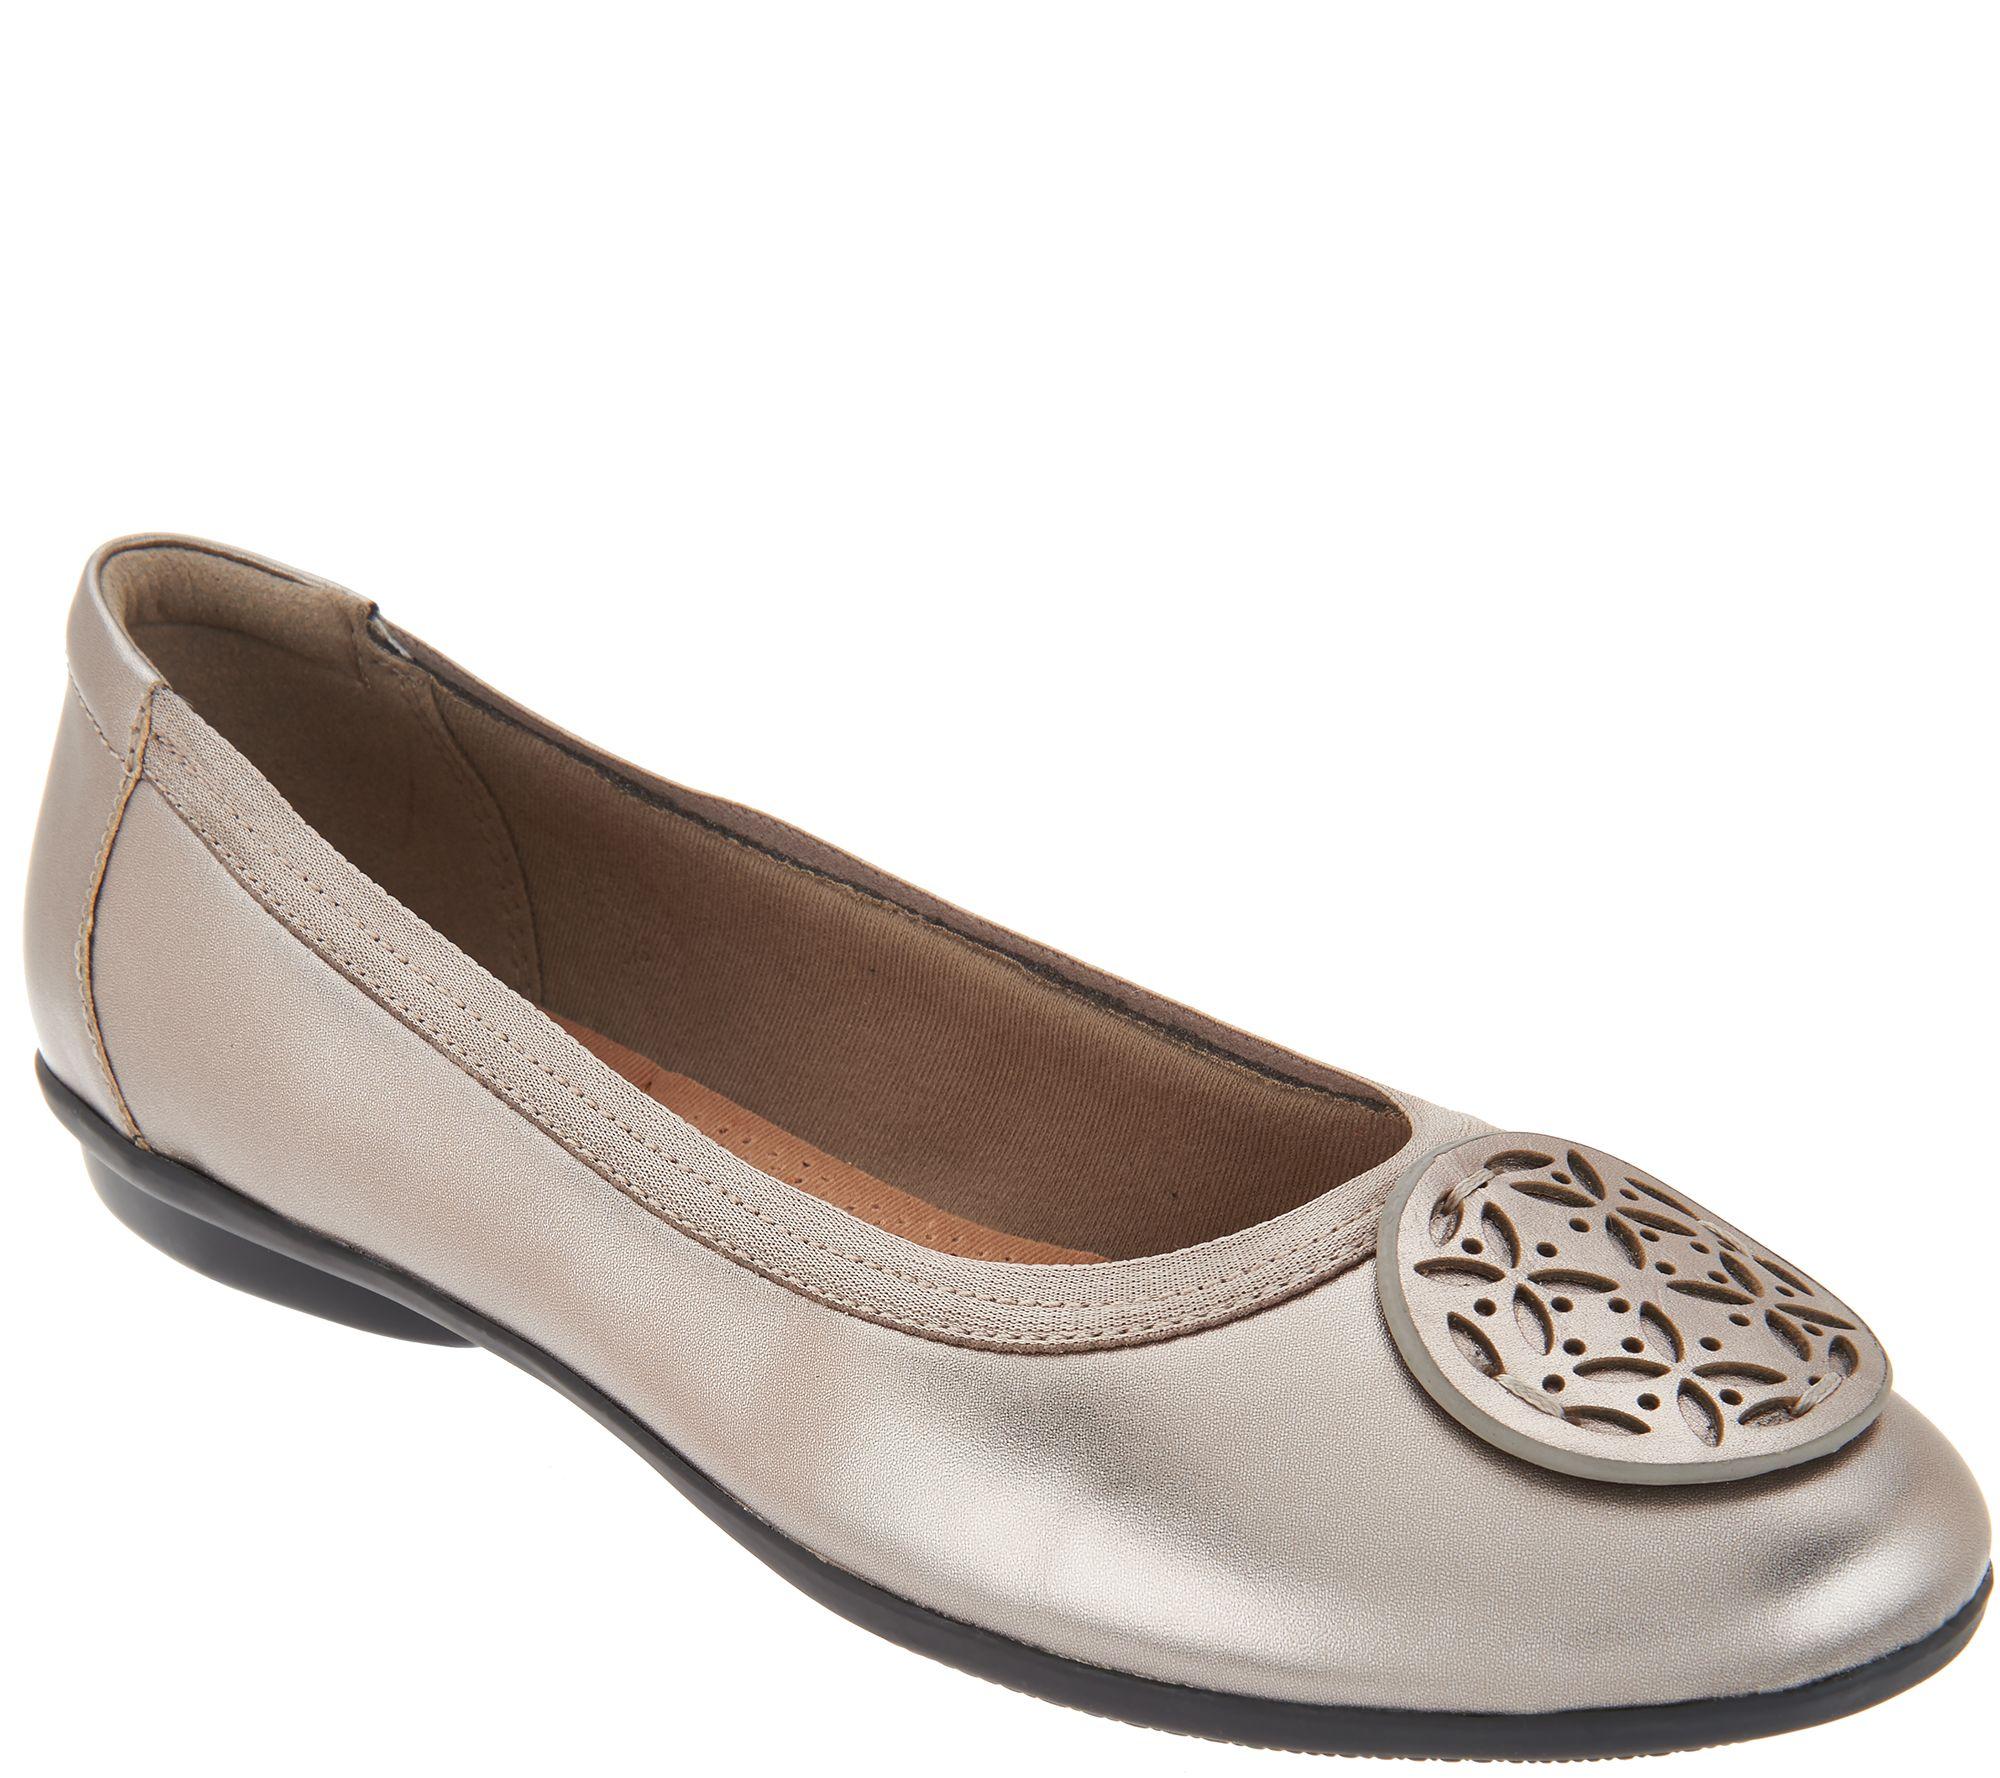 Clarks Leather Medallion Comfort Ballet Flats - Gracelin Lola - Page 1 —  QVC.com